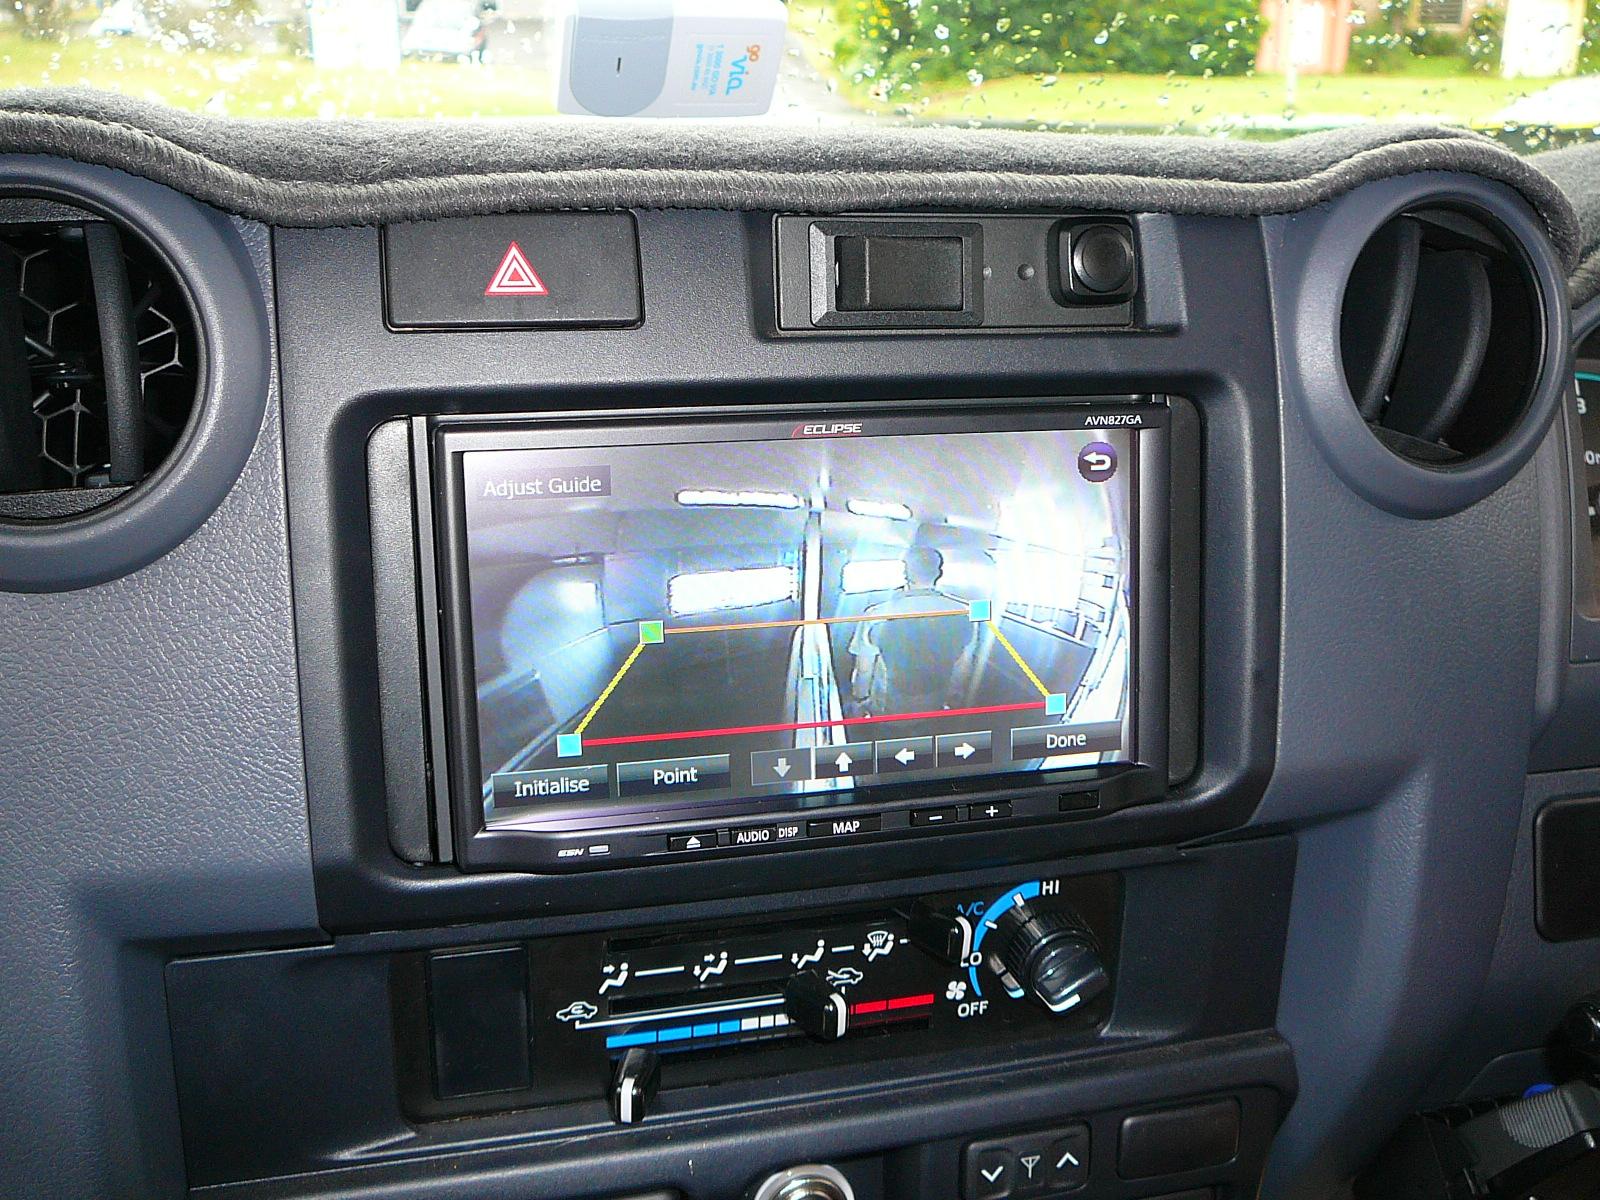 For VolksWagen VW Jetta 1999~2005 Car GPS Navigation